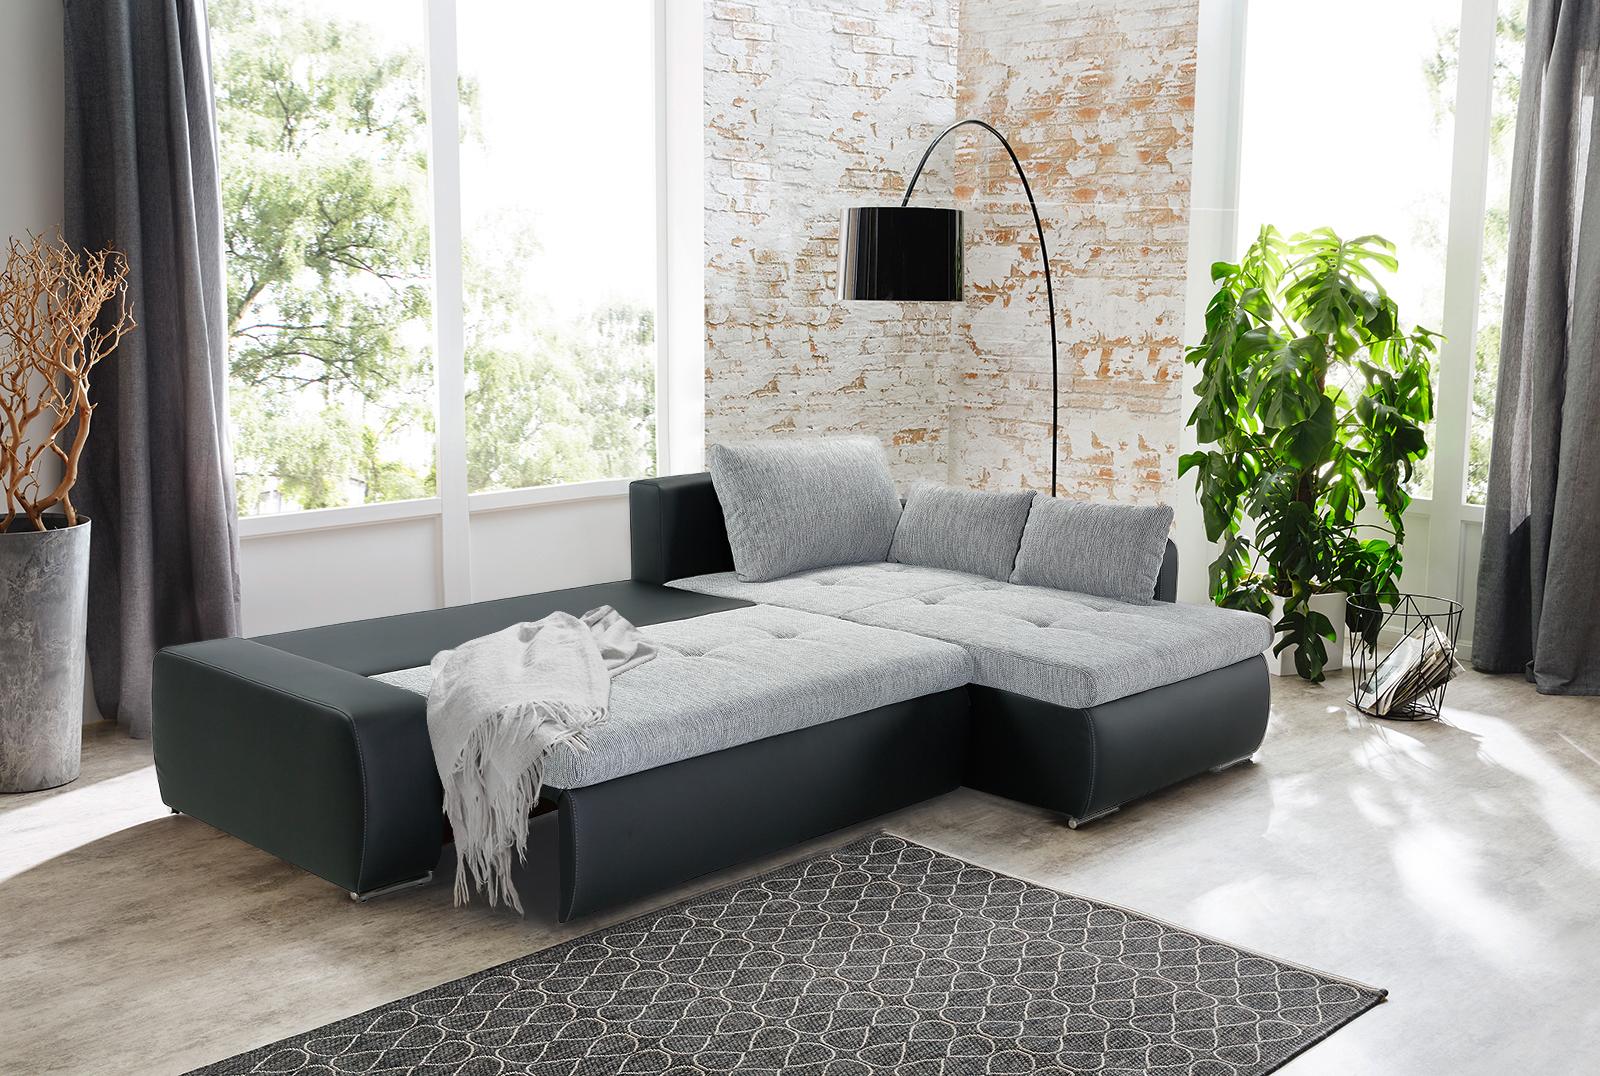 jockenh fer amberg ecksofa grau schwarz m bel letz ihr online shop. Black Bedroom Furniture Sets. Home Design Ideas